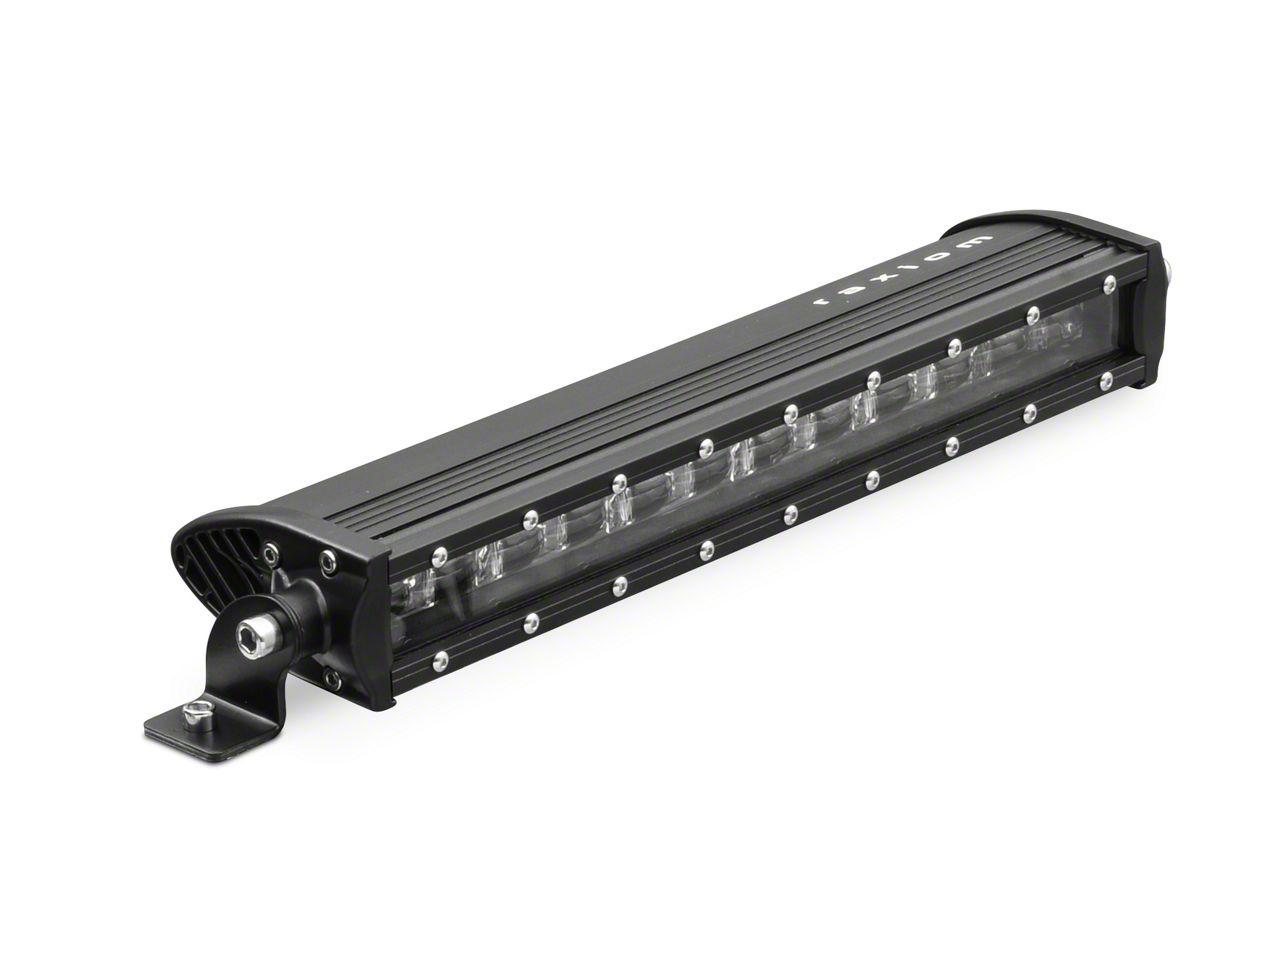 Raxiom 14 in. Super Slim Dual Row LED Light Bar